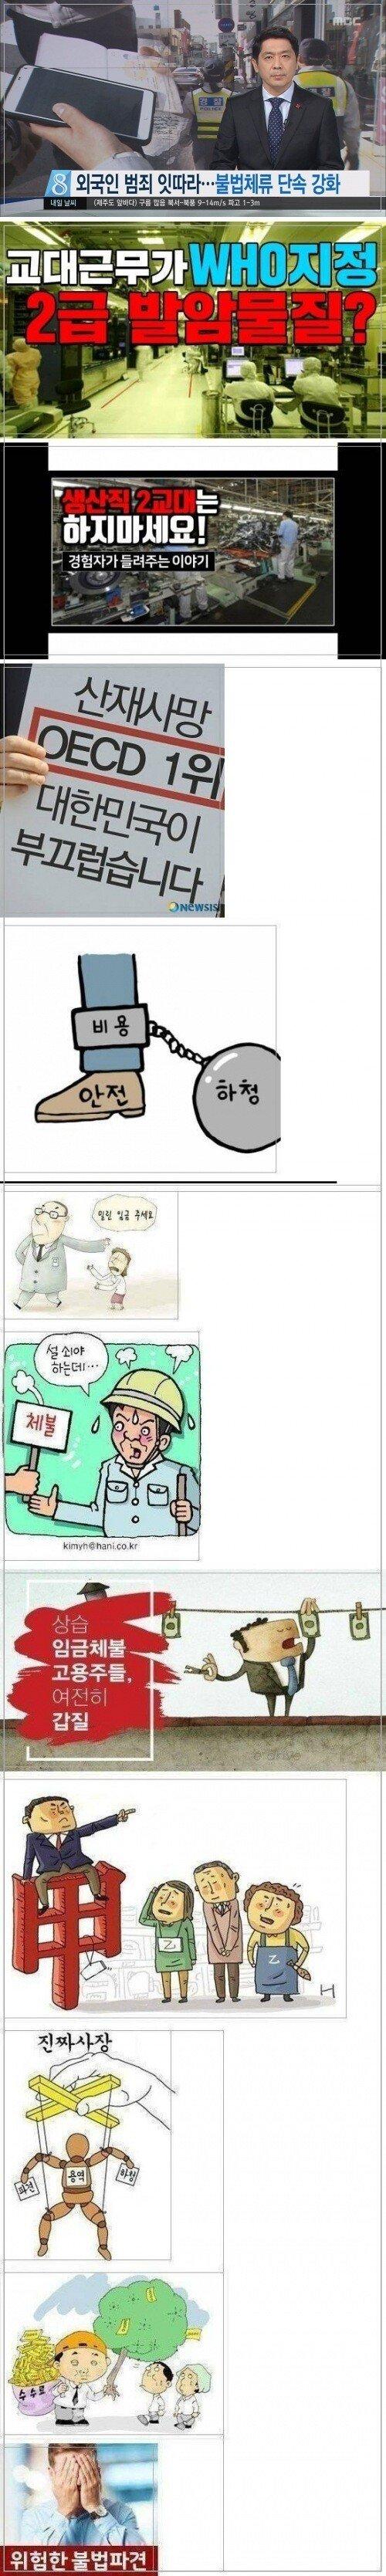 0001.jpg 한국 정부에 열받은 흔한 조선족........jpg